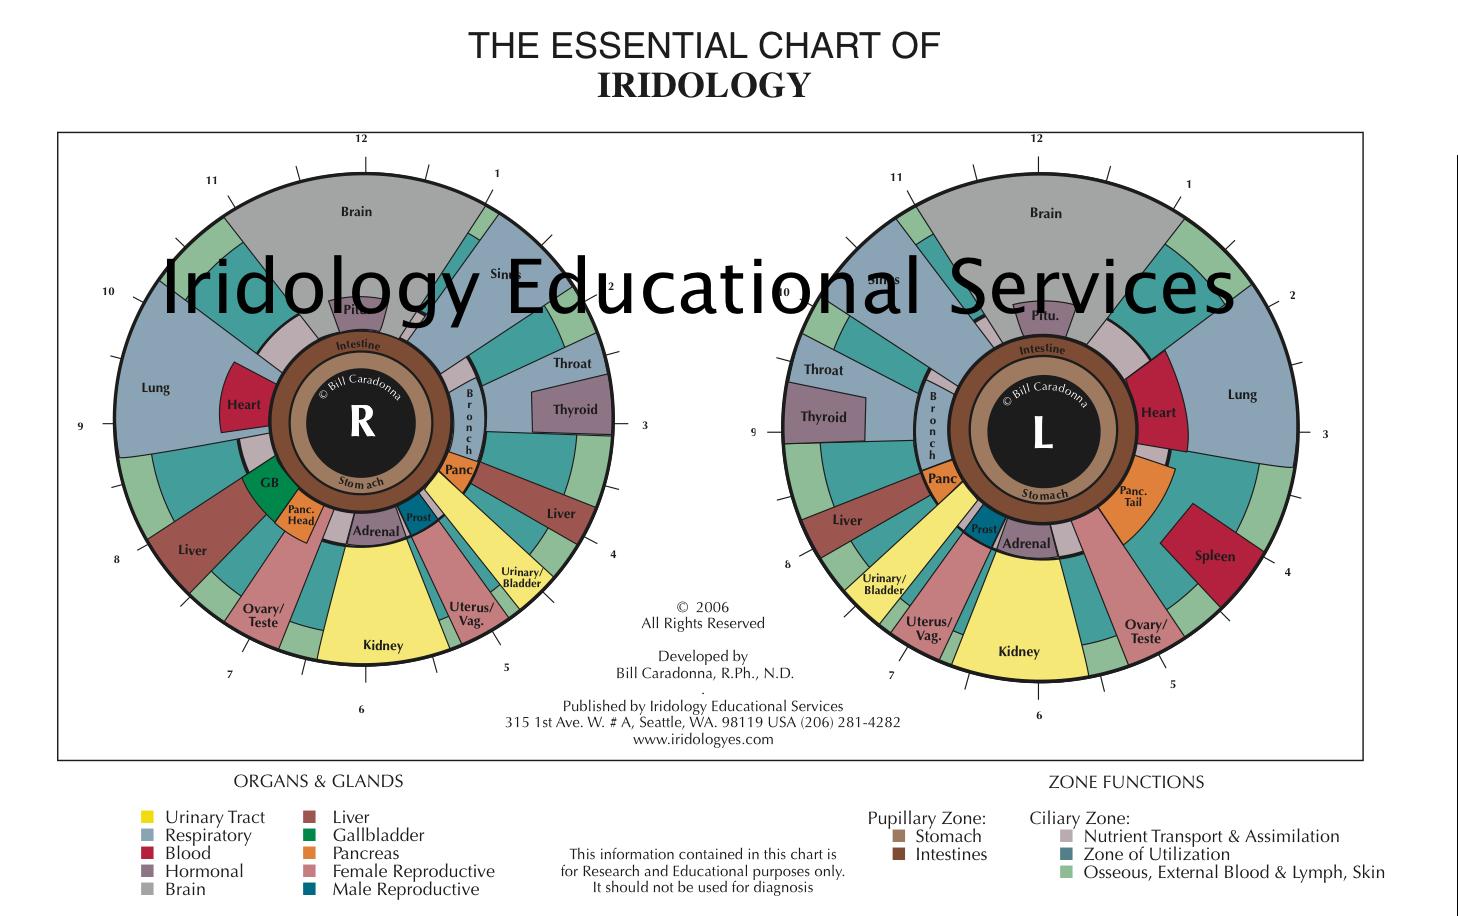 THE ESSENTIAL CHART OF IRIDOLOGY